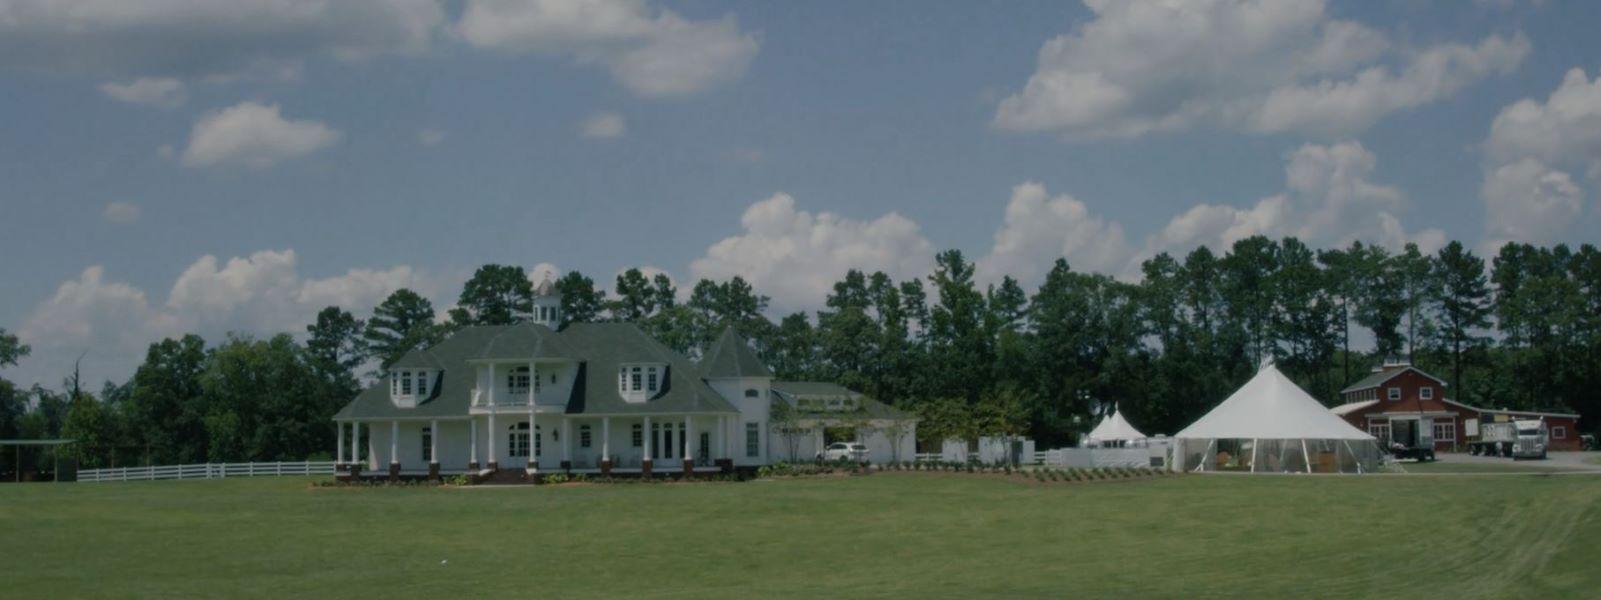 Robertson family farm in West Monroe, Louisiana